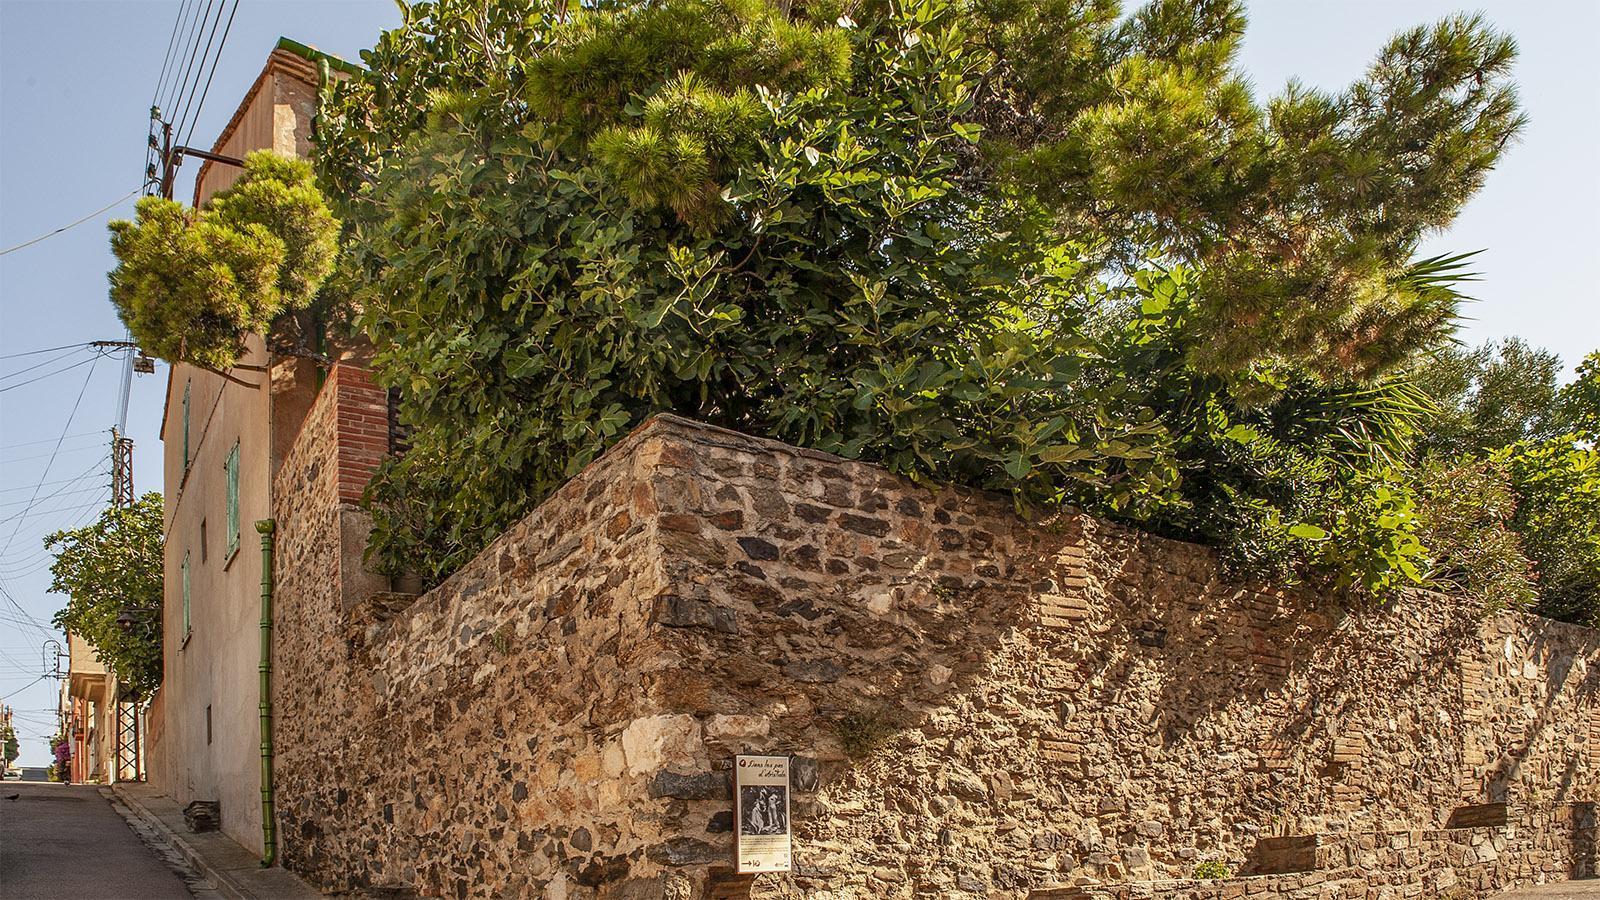 Banyuls. Ehemaliges Anwesen von Maillol. Foto: Hilke Maunder